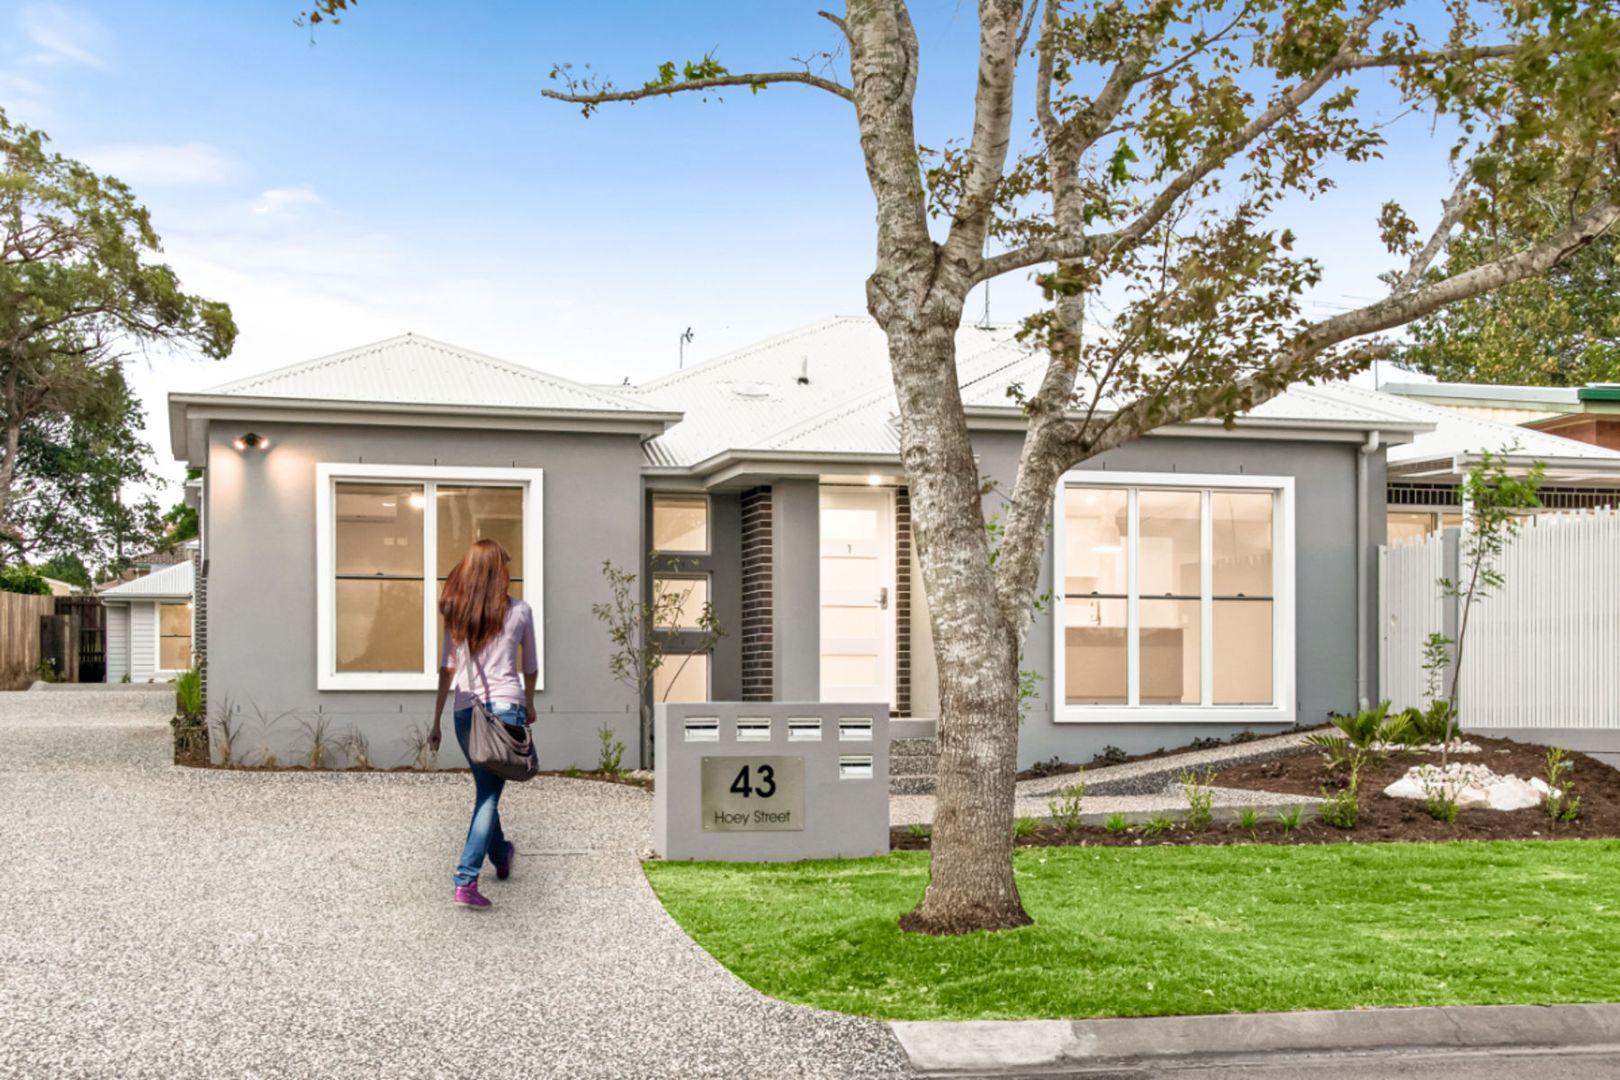 43 Hoey Street, Kearneys Spring QLD 4350, Image 0